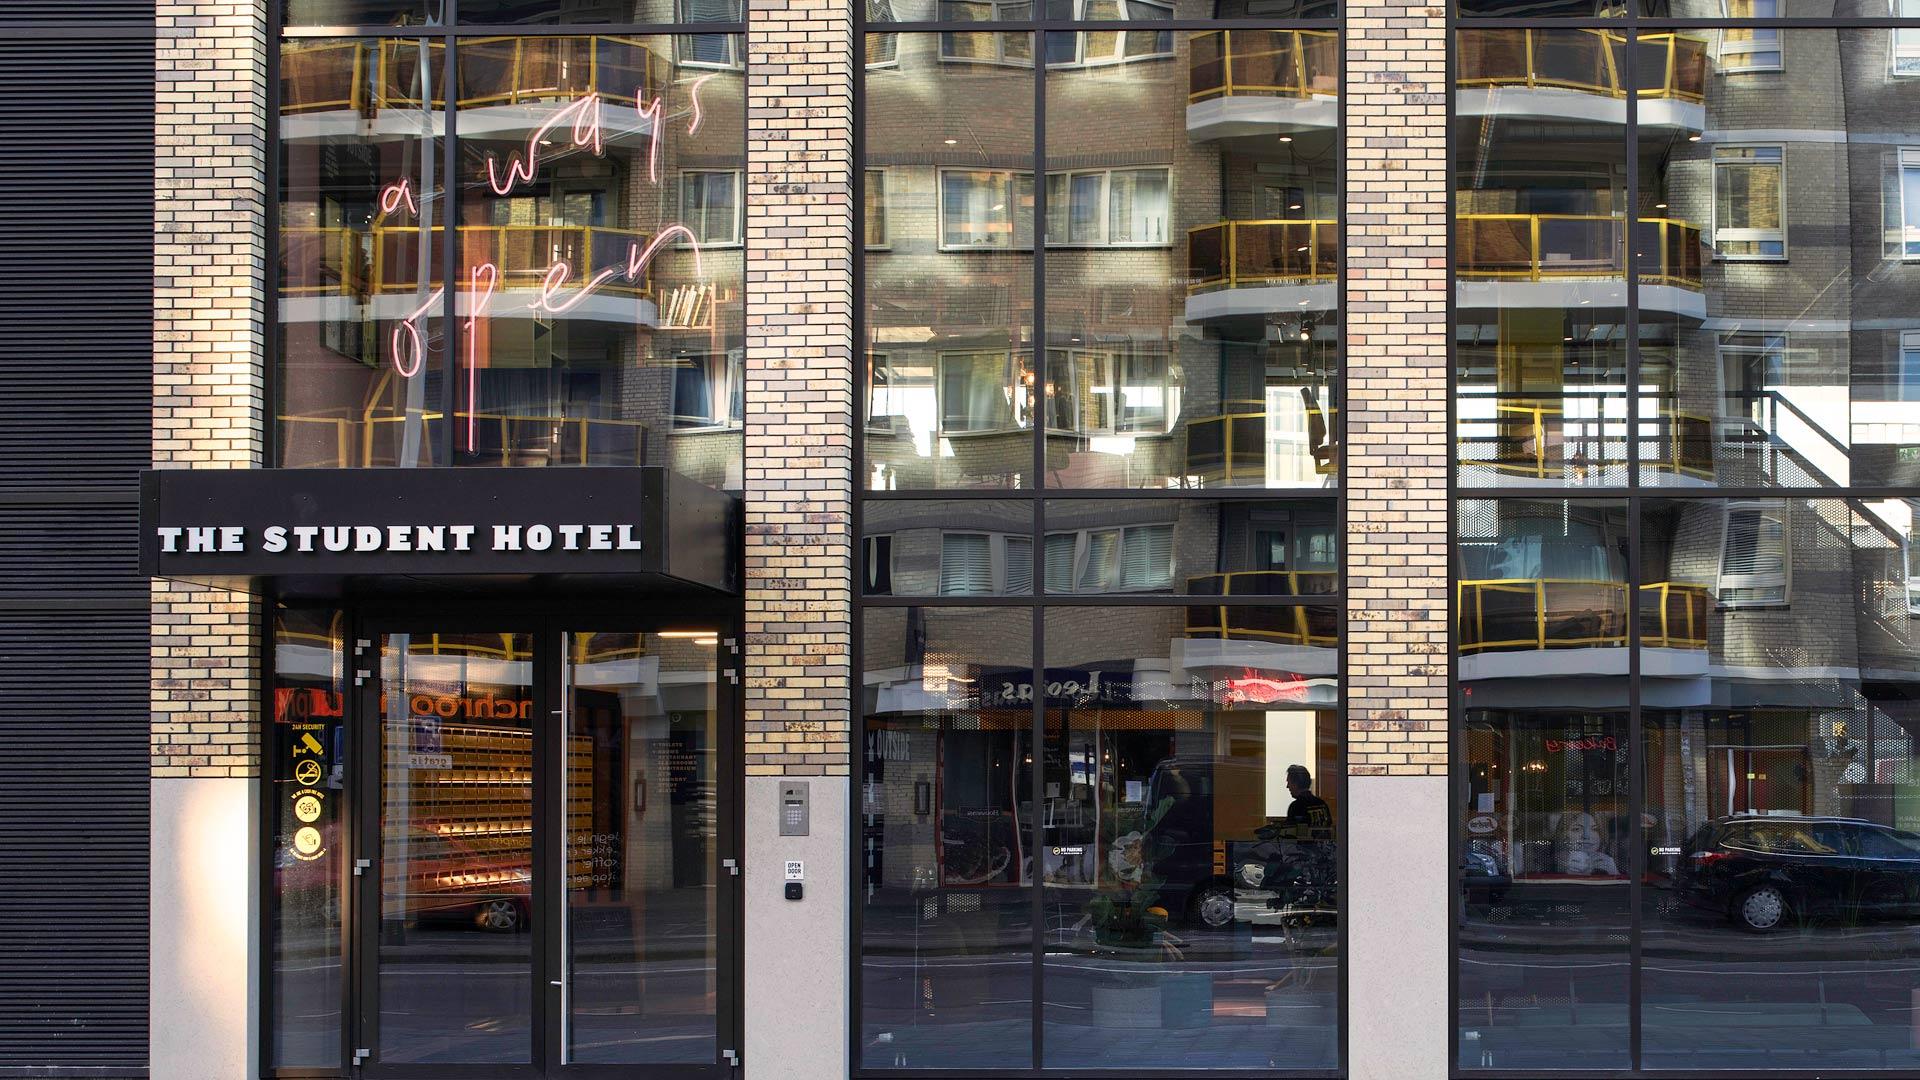 Oz architecture urbanism and design research for Design hotel eindhoven